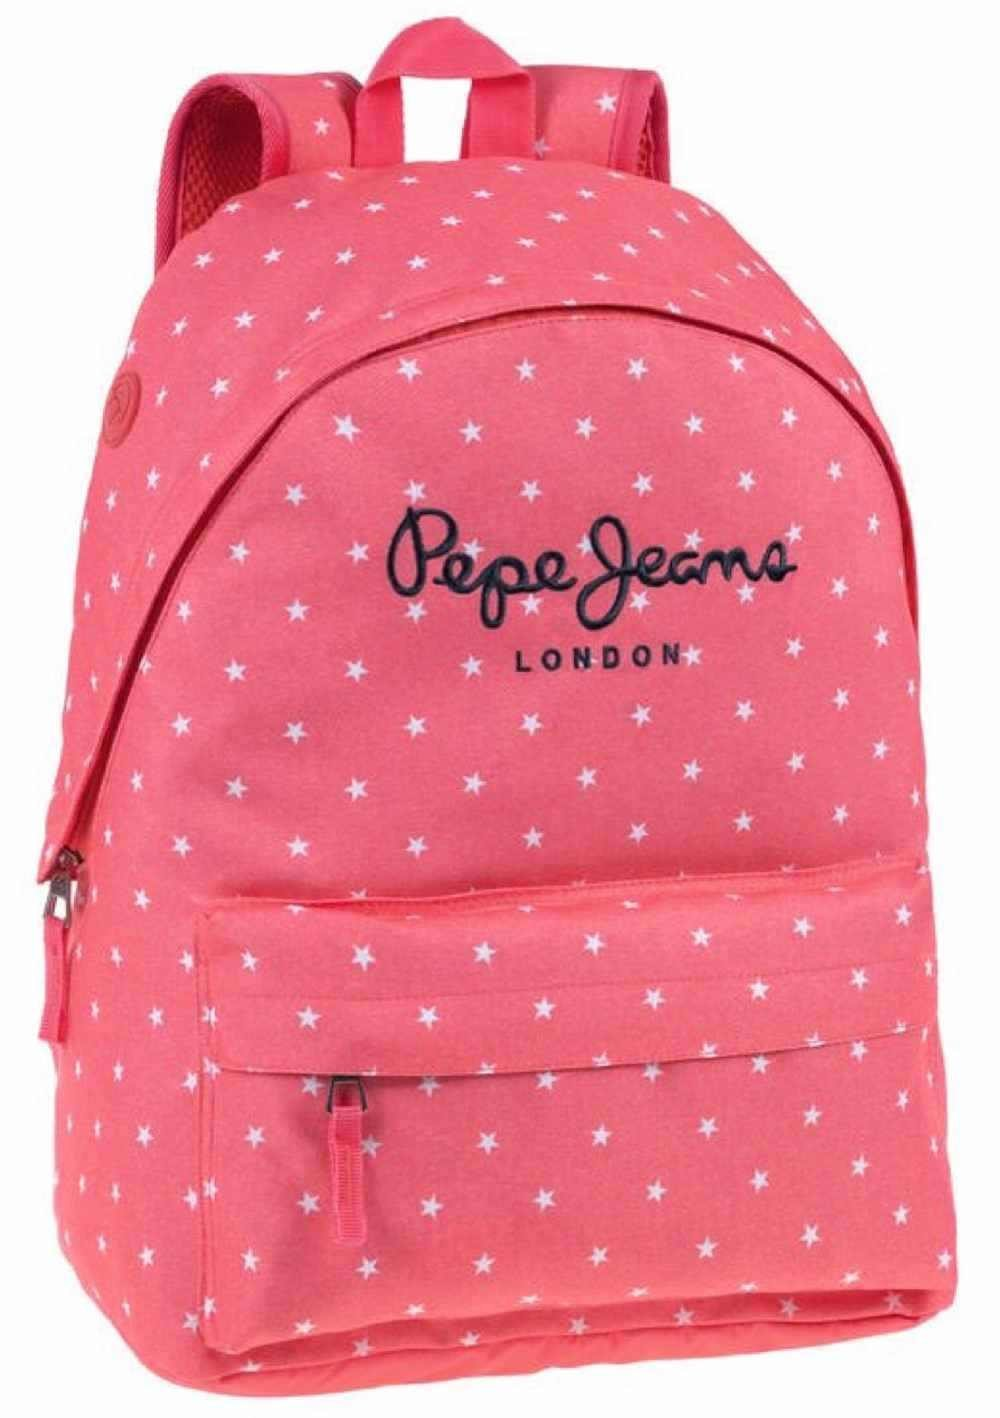 Pepe Jeans Stars Mochila Escolar, 22.85 litros, Color Naranja: Amazon.es: Equipaje